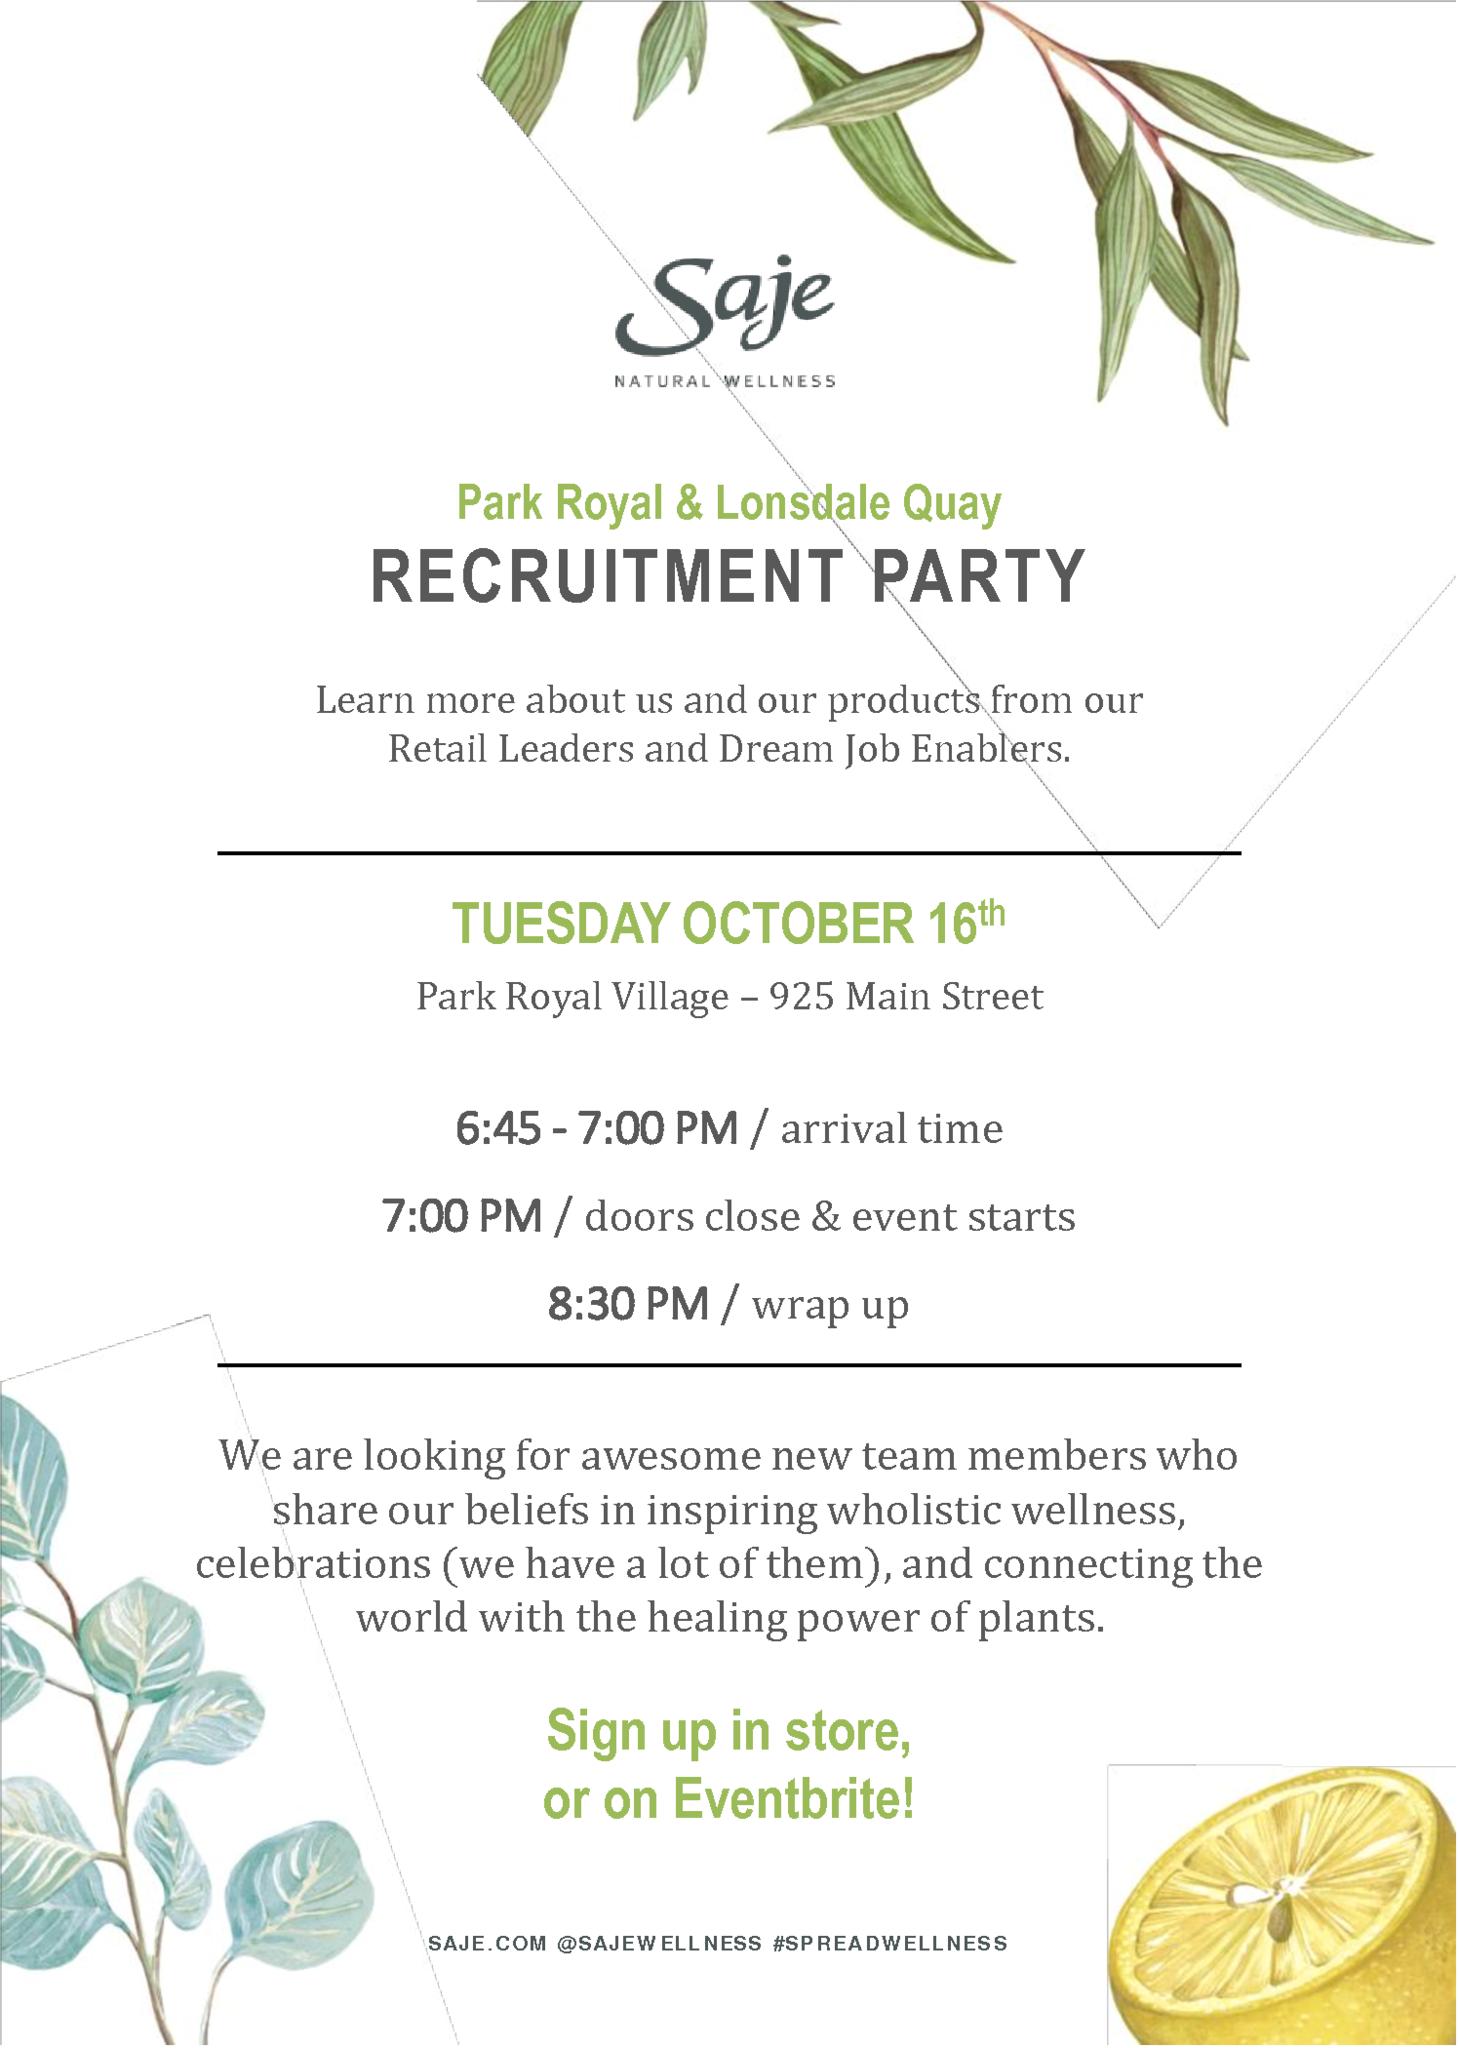 Saje Recruitment Party